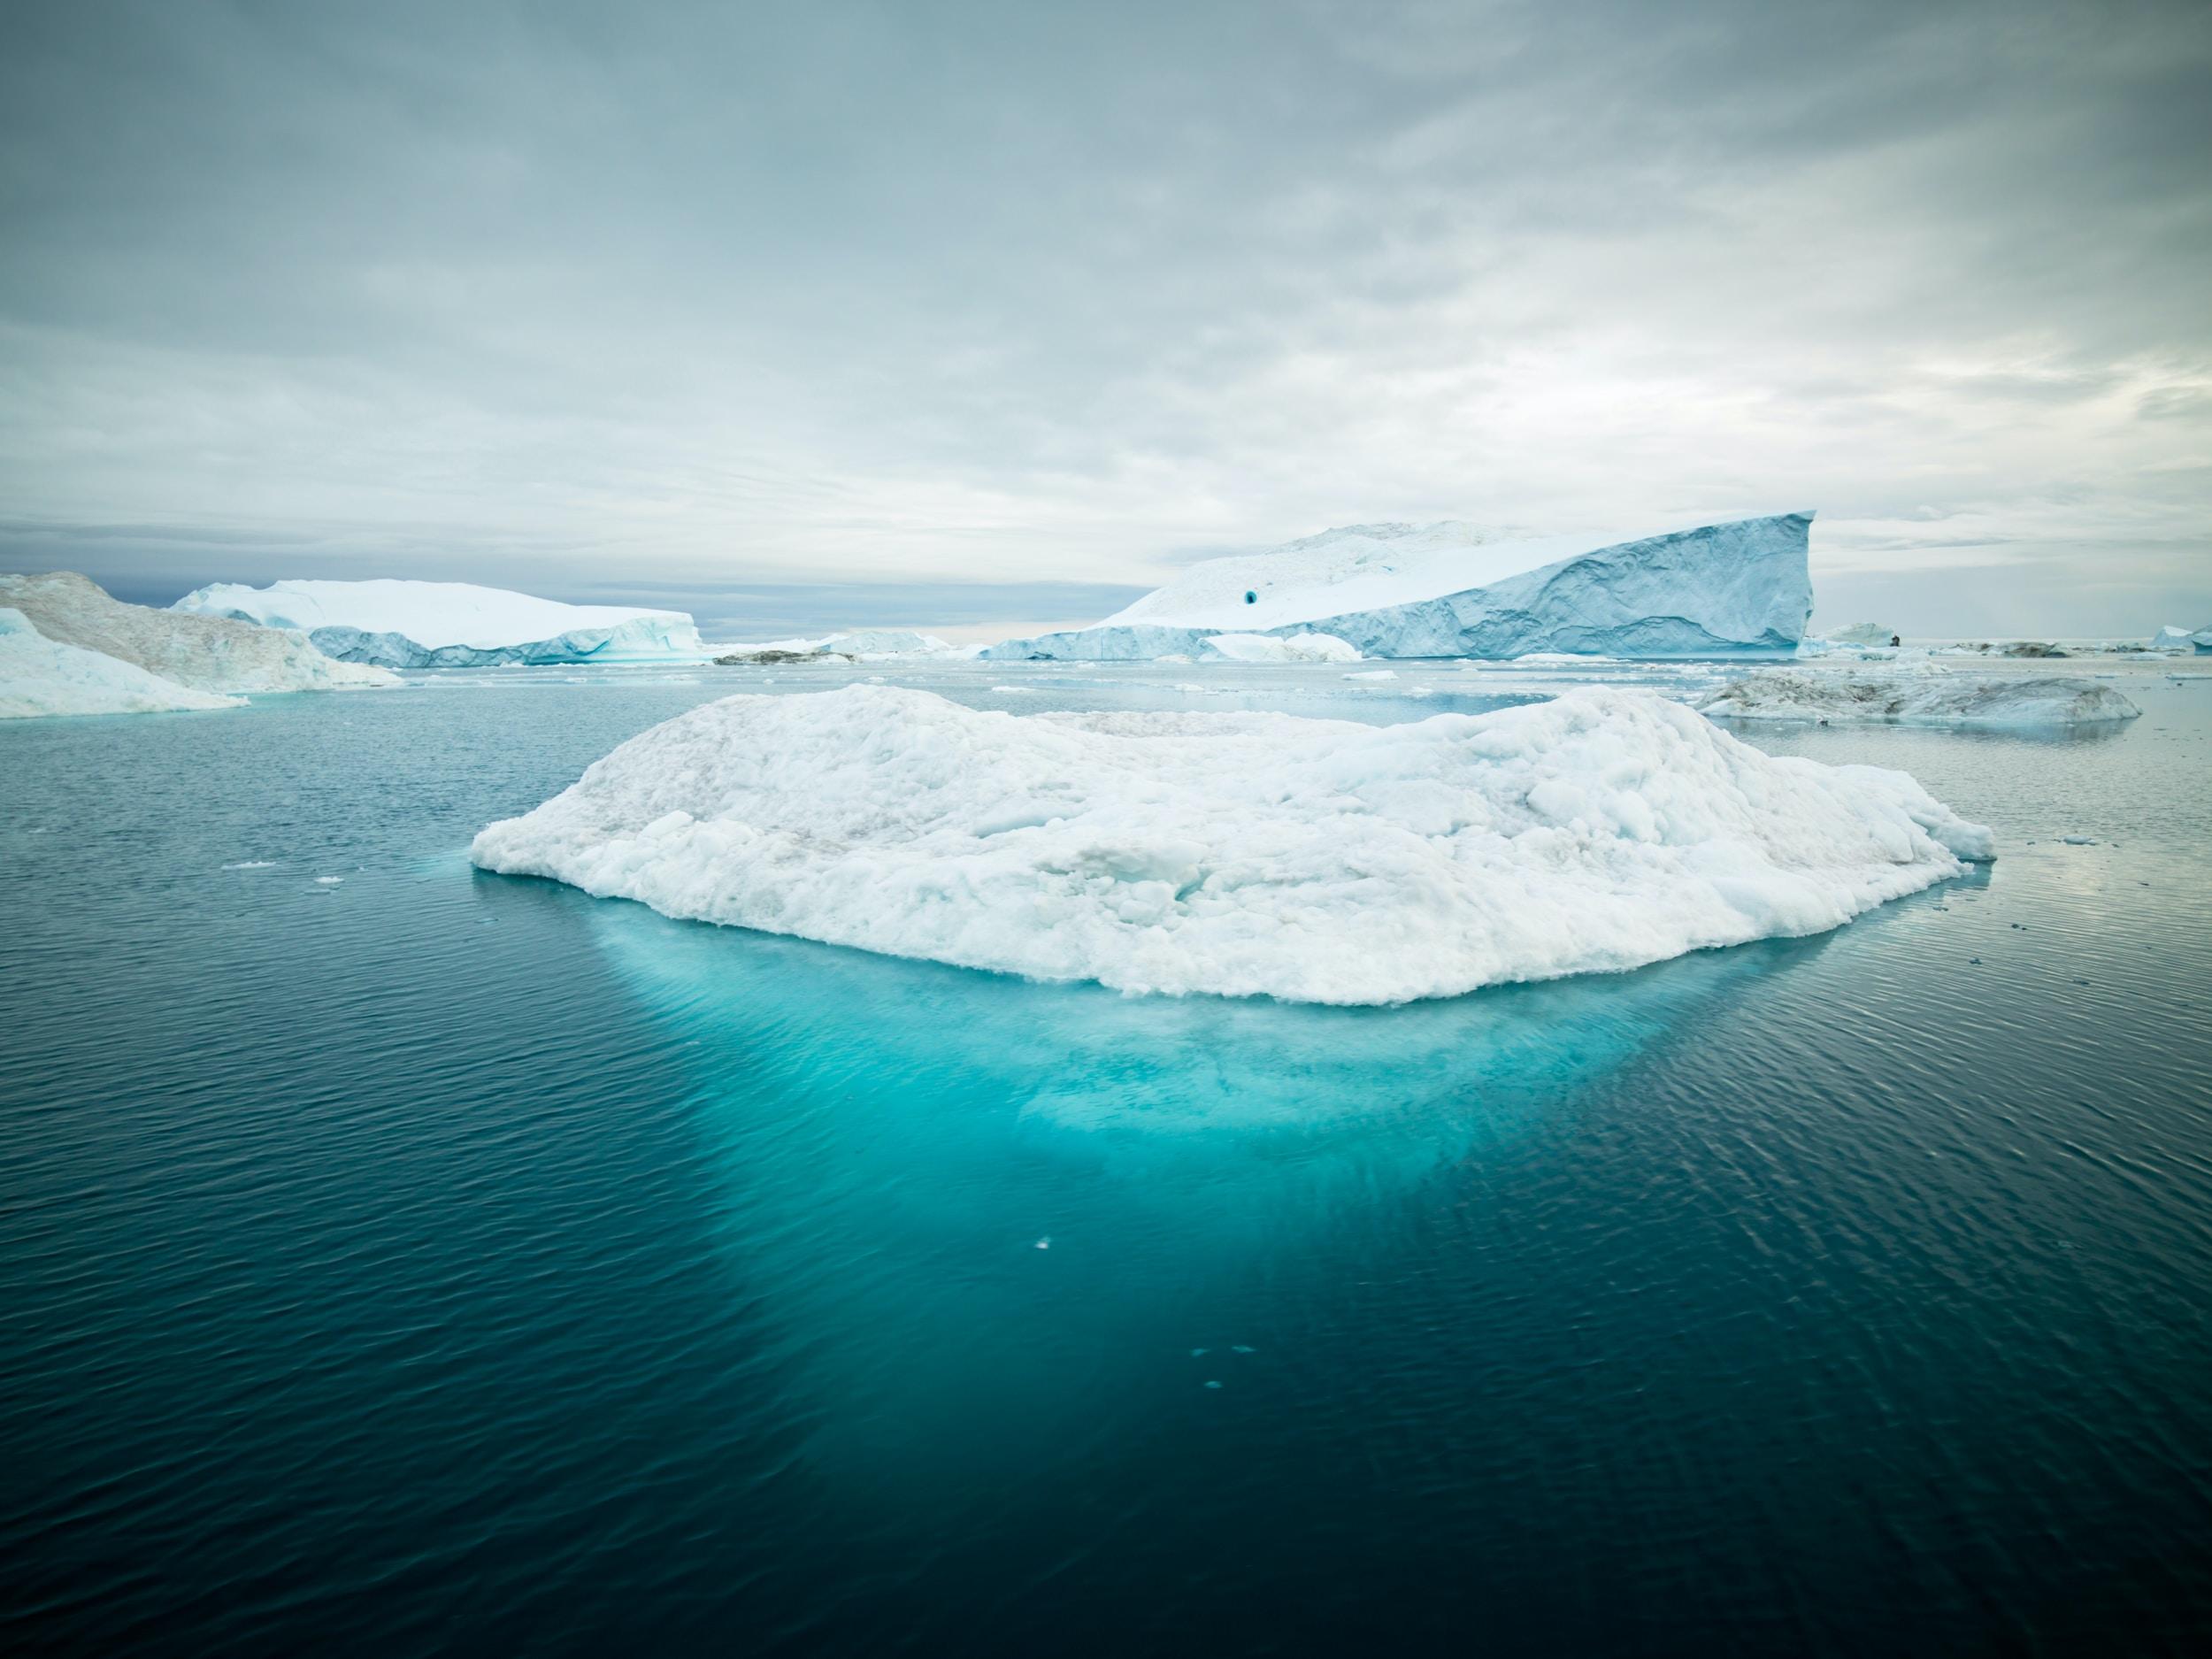 photo of iceberg